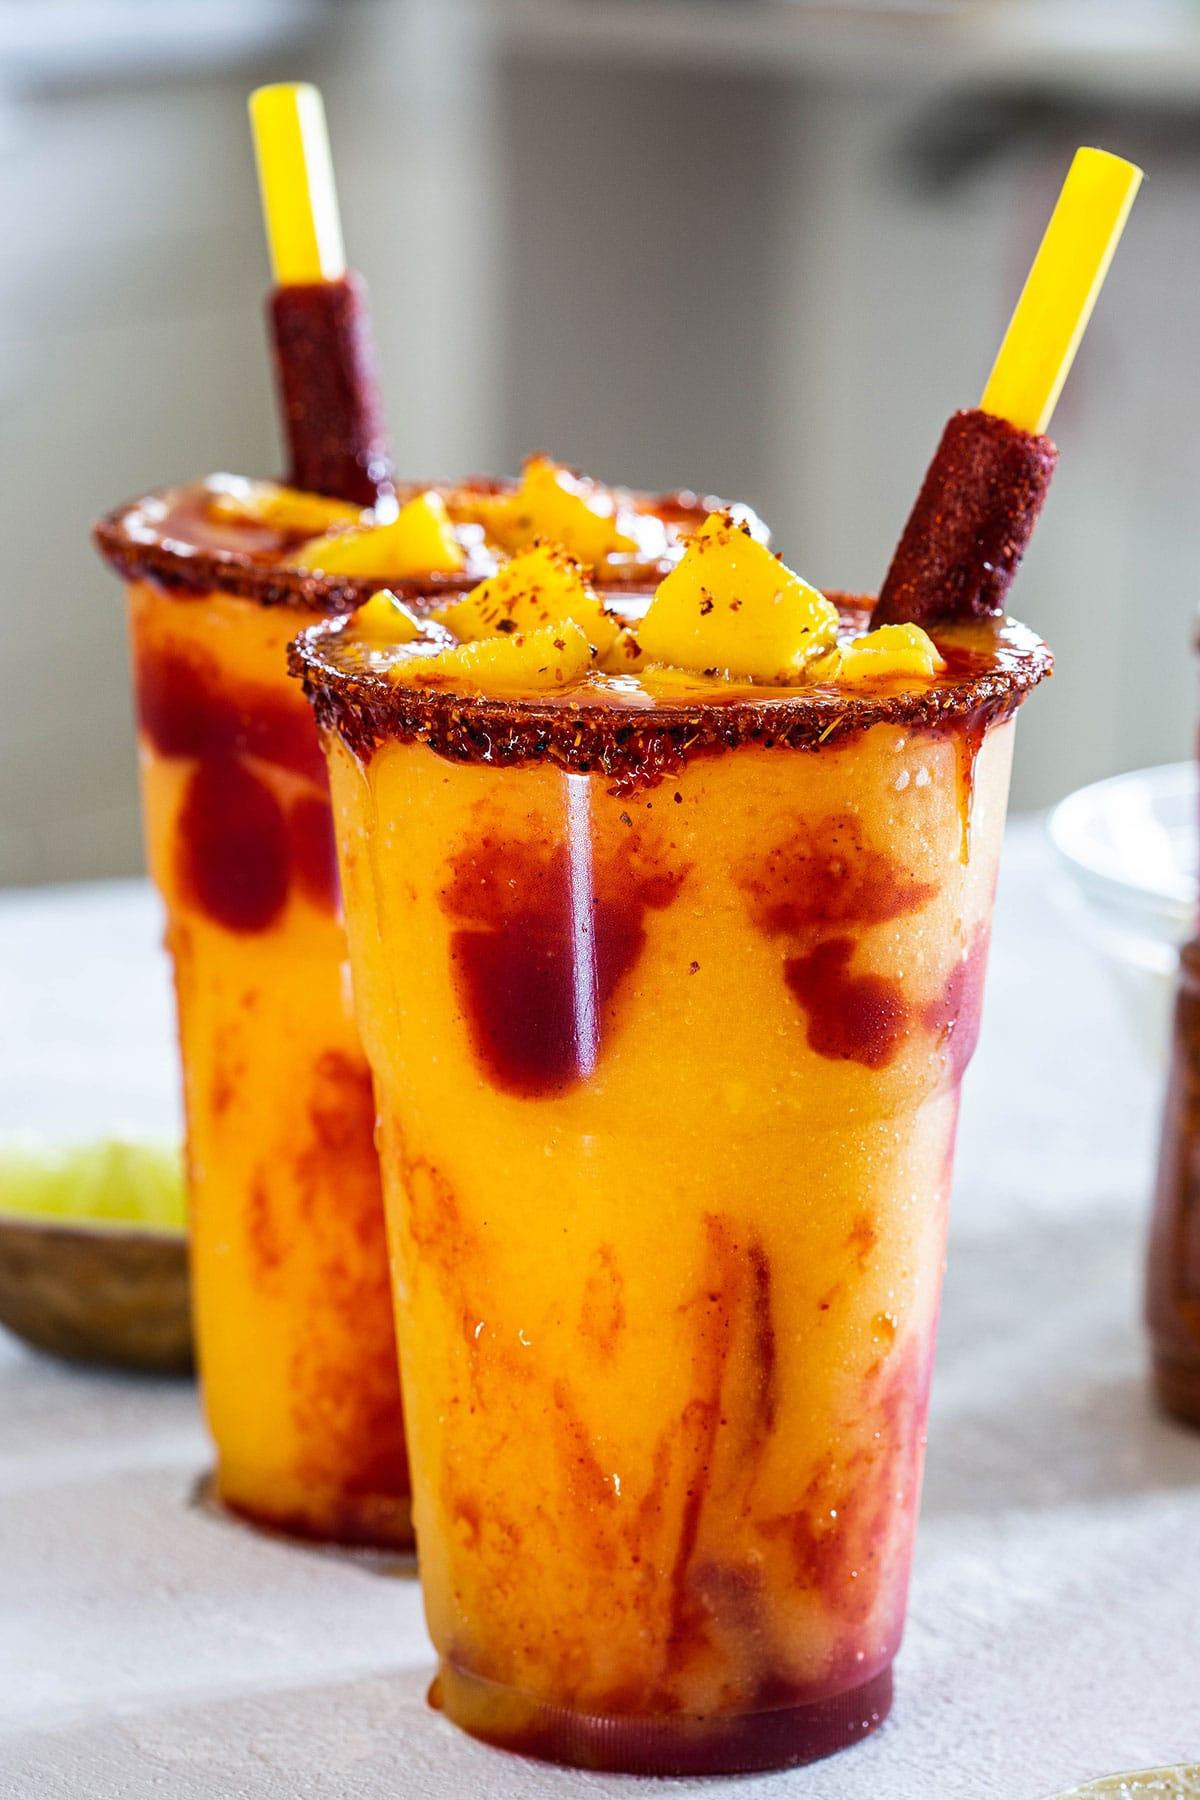 Two glasses with mexican mango frozen treat called mangonadas or chamoyadas.